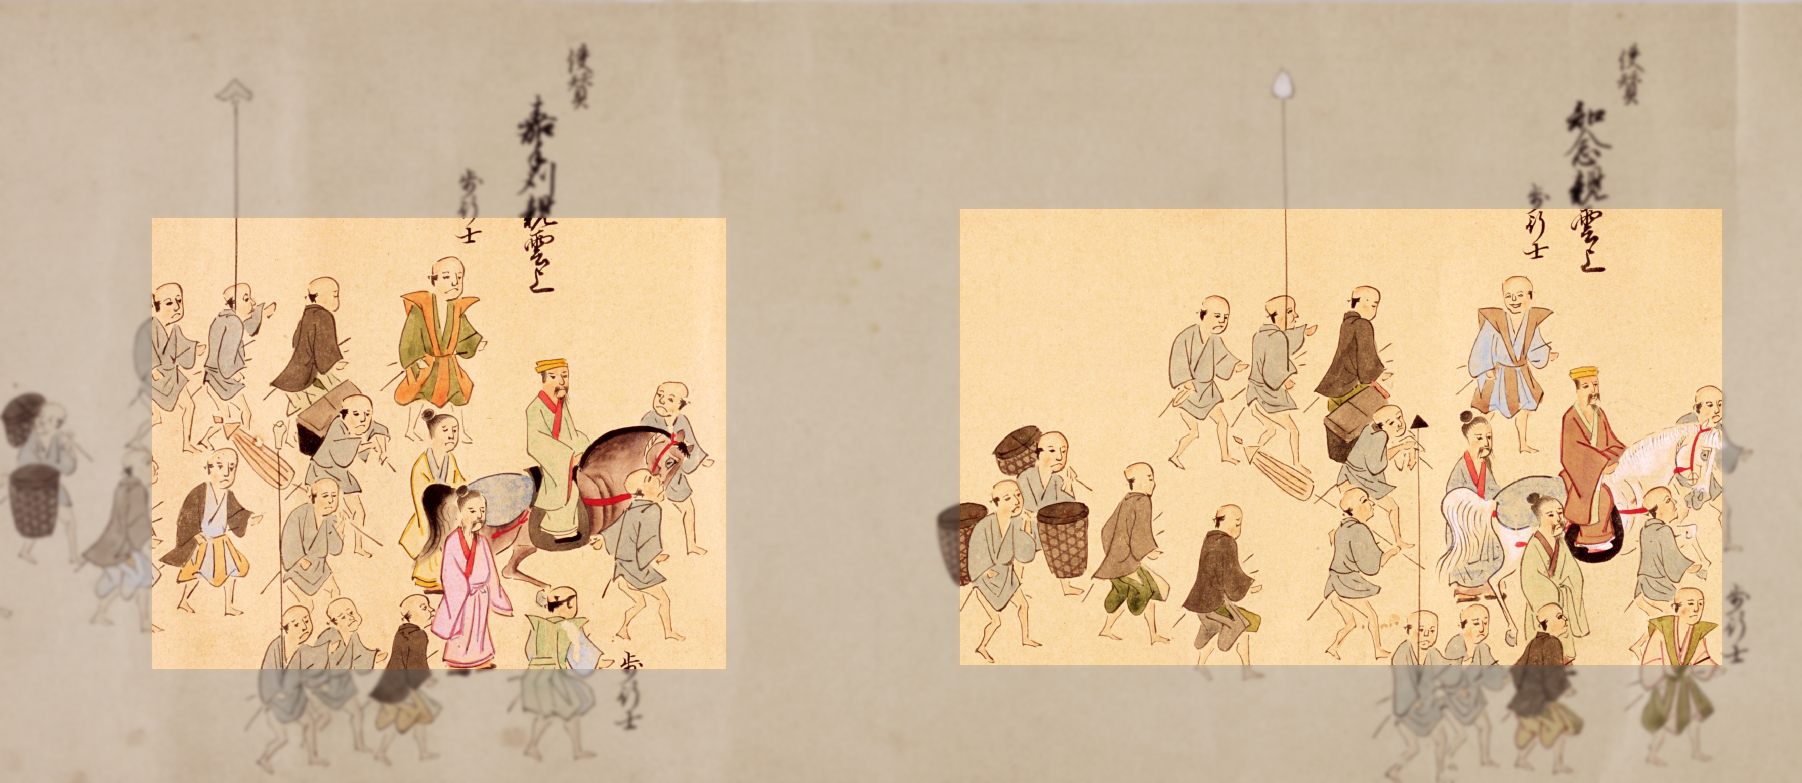 1710, Kadekari Pechin and Chinen Pechin as Shisan. Japan National Archives.